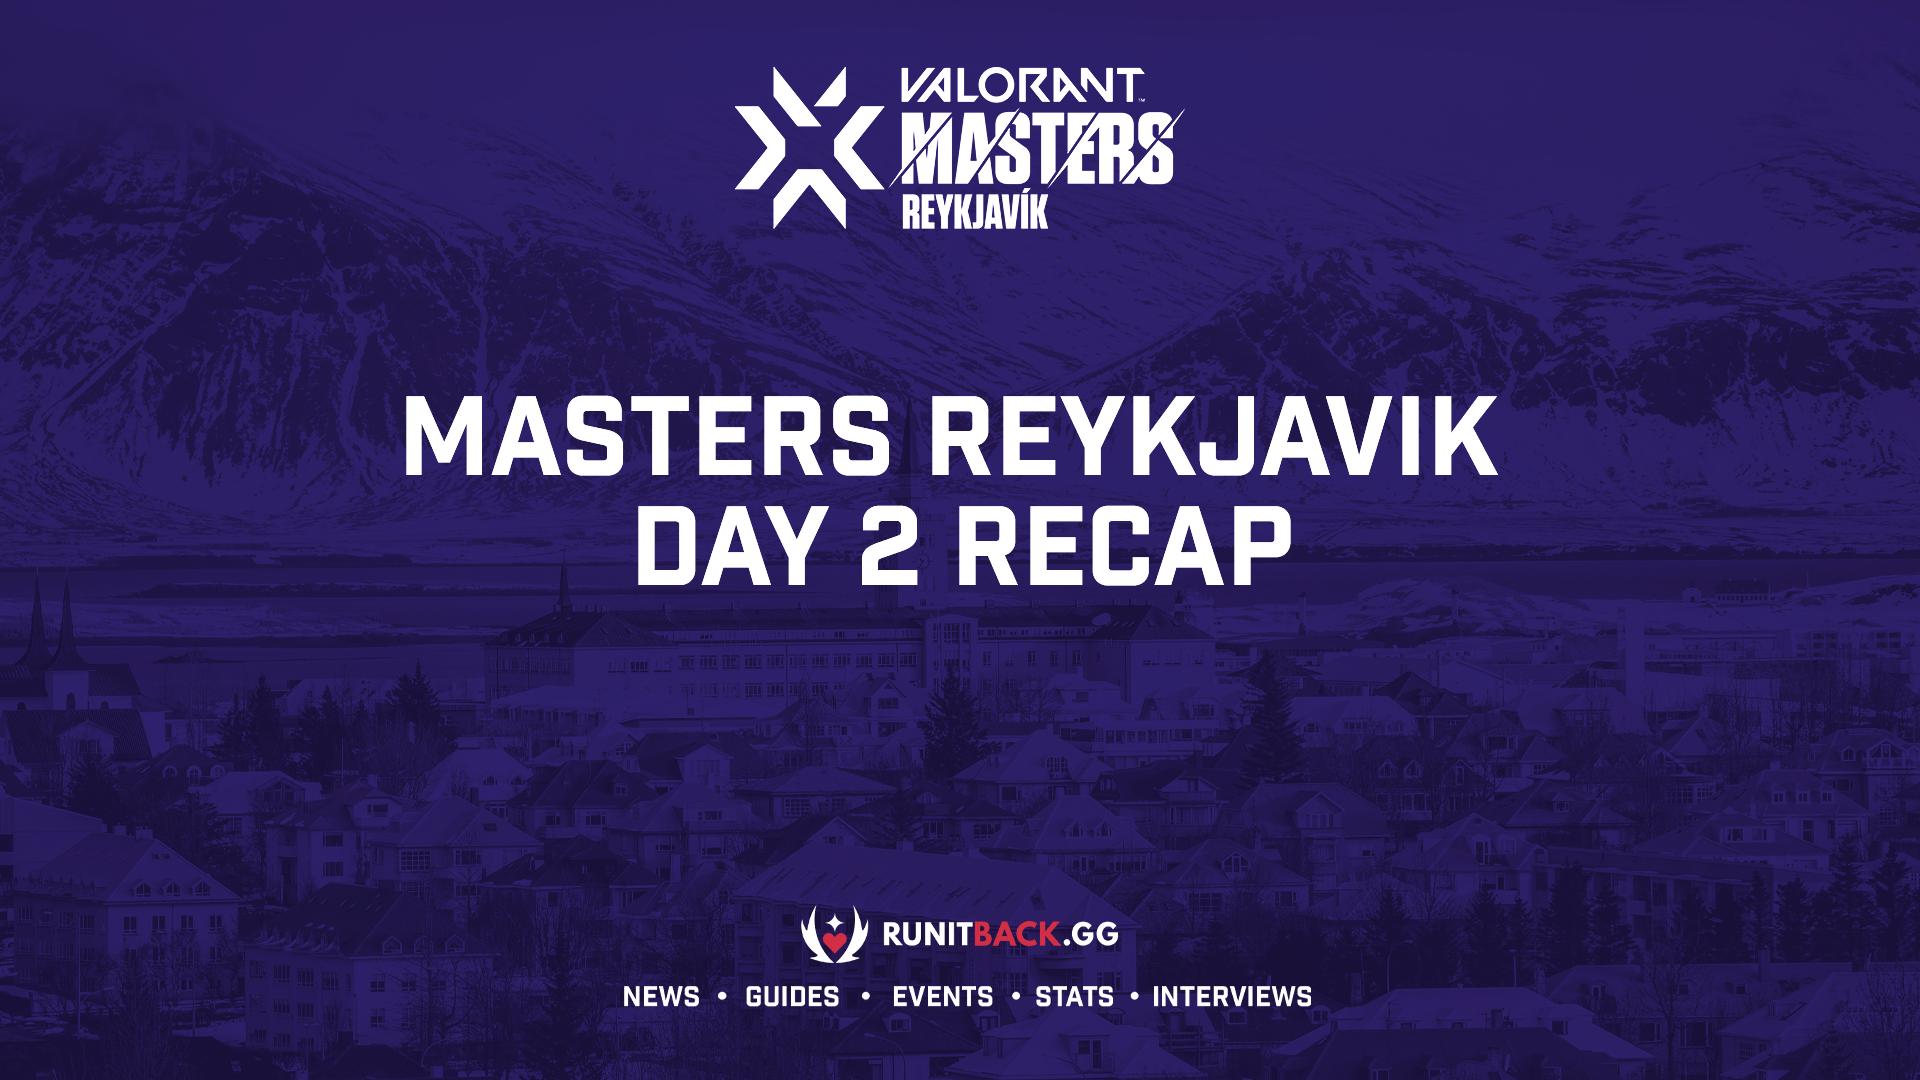 Masters Reykjavik sees first pair of EU vs NA matchups — Day 2 Recap